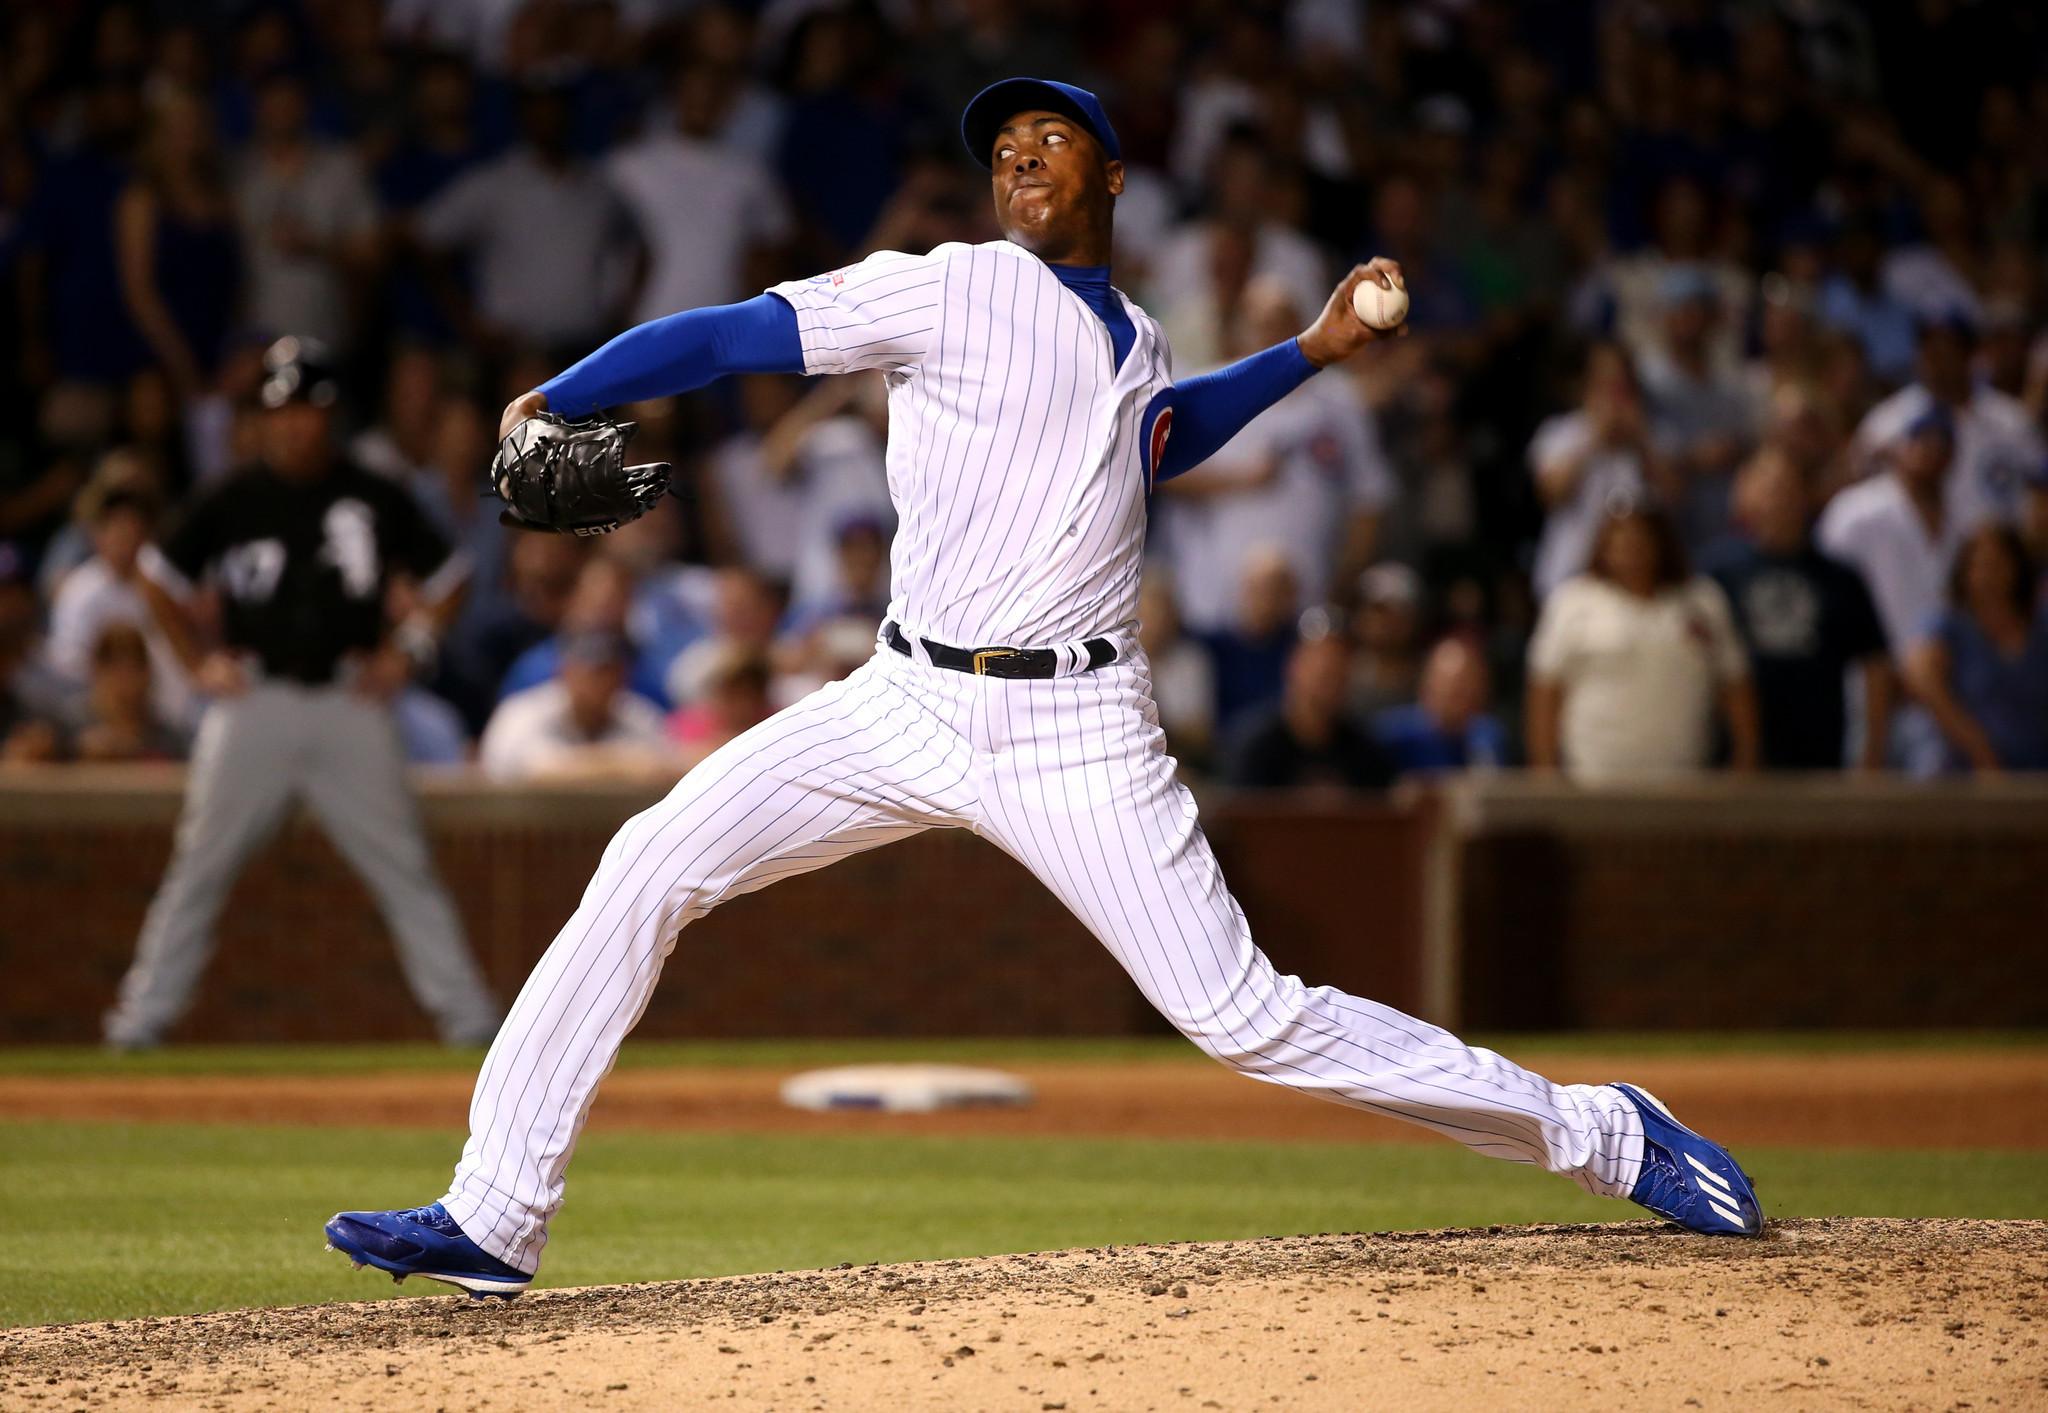 Cubs pitcher Aroldis Chapman: a math problem in a baseball uniform ...